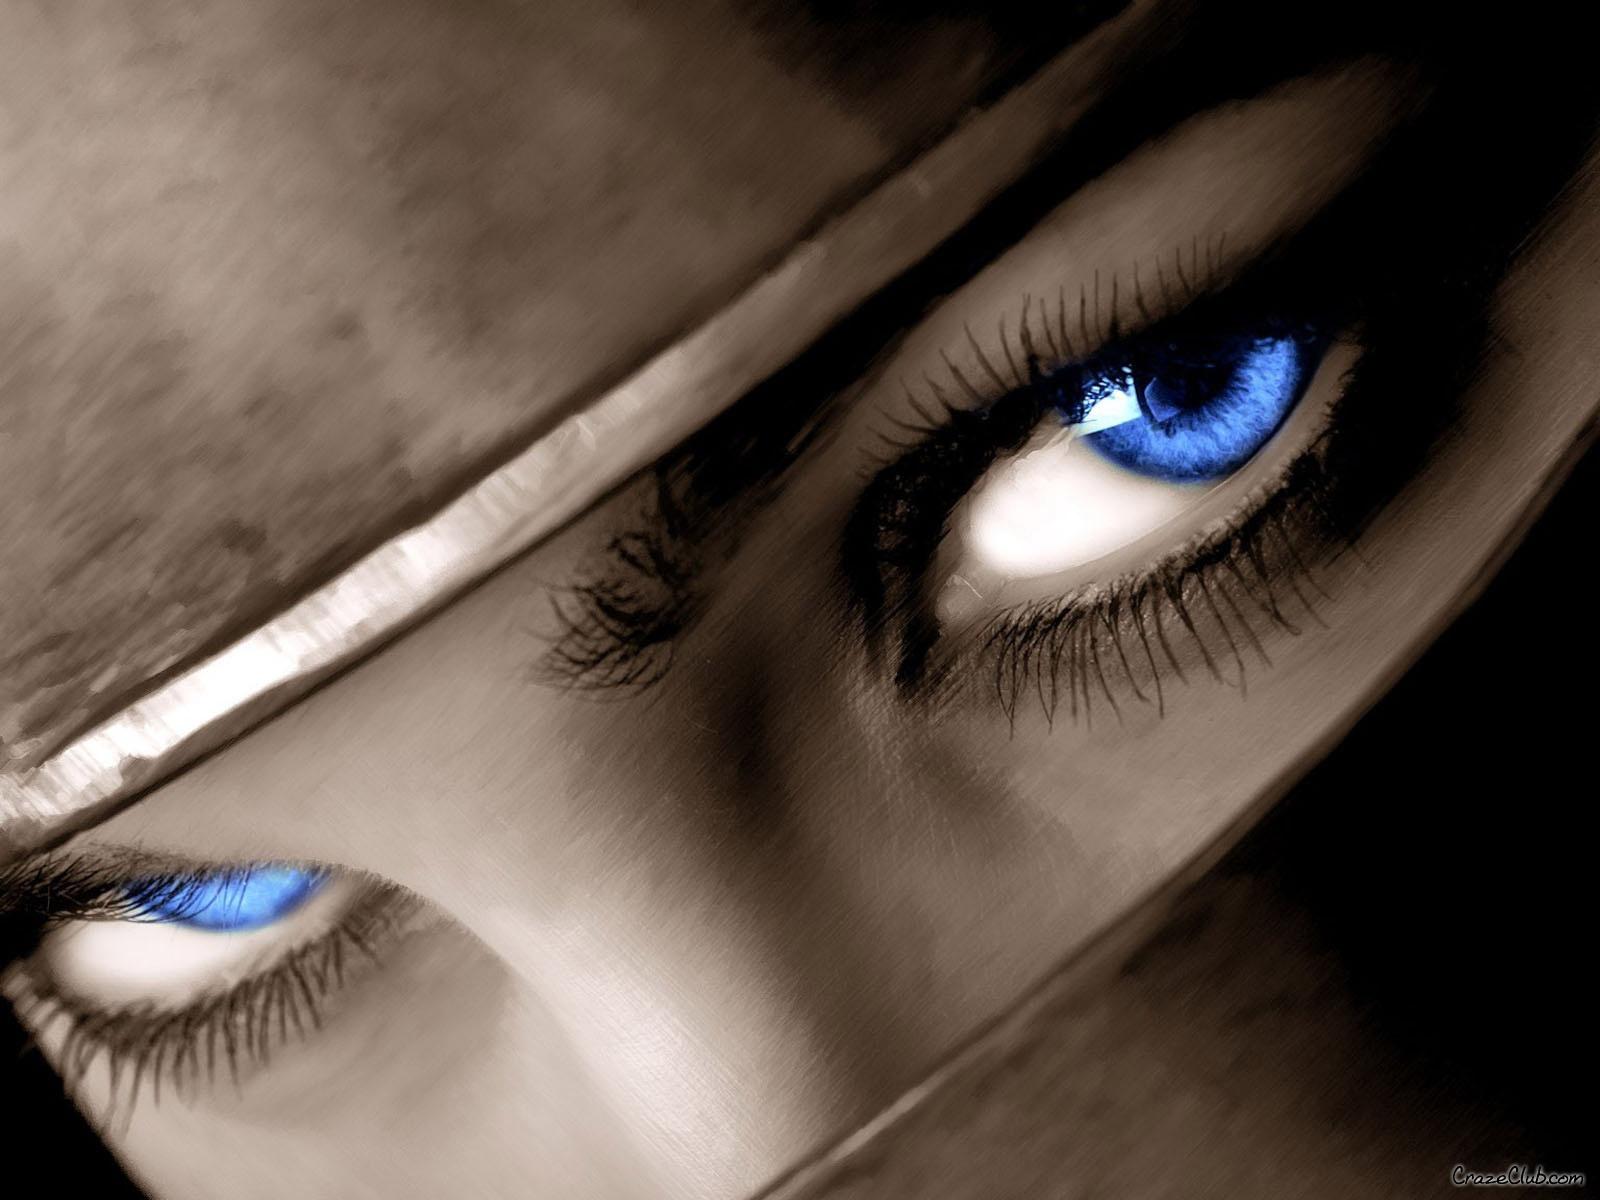 http://3.bp.blogspot.com/_c72kc4JbsgY/TOGAsjC3rDI/AAAAAAAAEPI/O0GP1uBzsaE/s1600/fantasy-cg-girls-wallpaper+%25289%2529.jpg